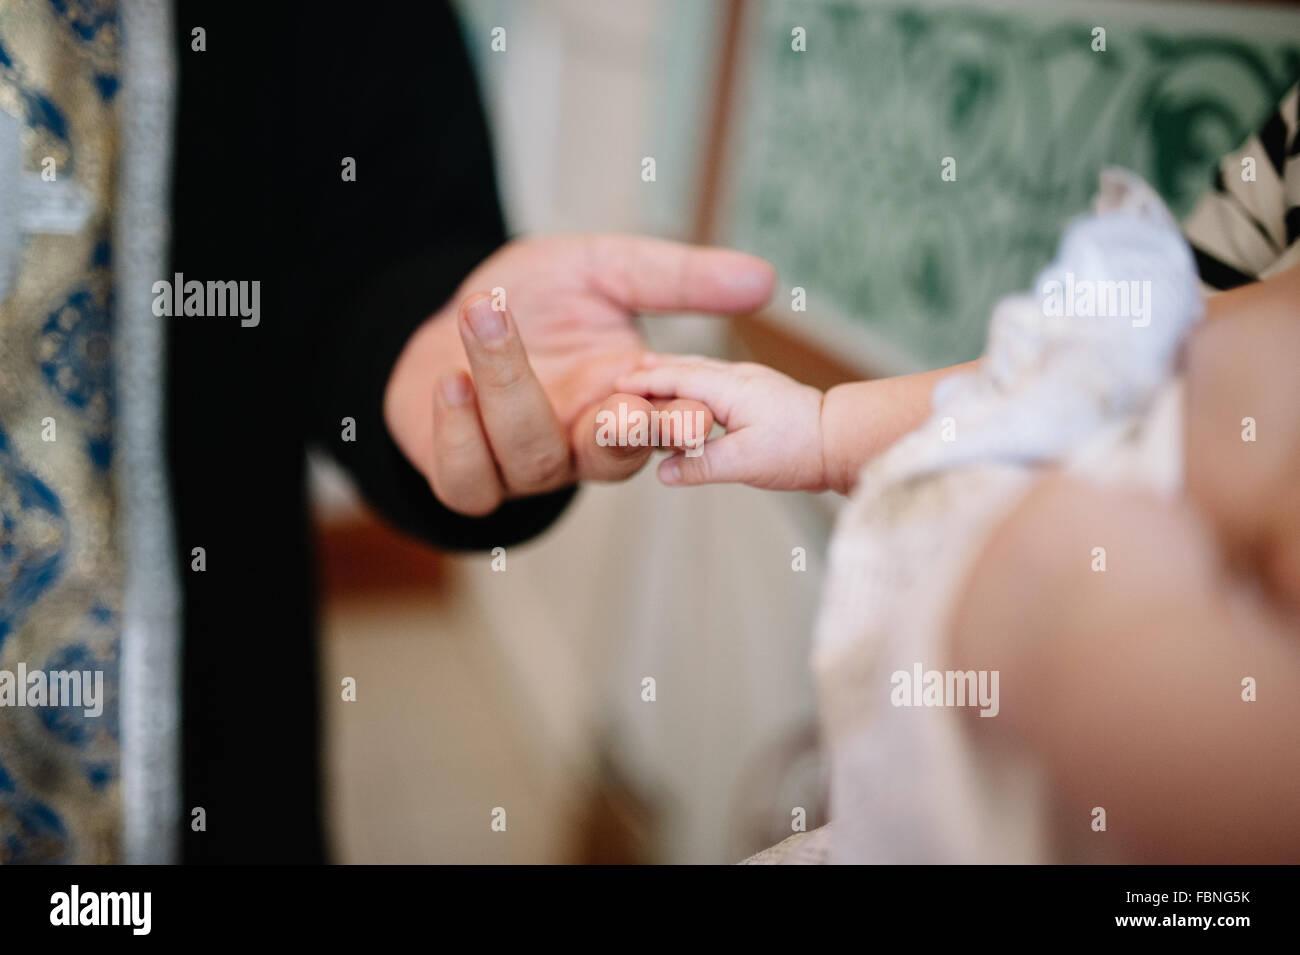 holding baby hand during christening Orthodox baptism - Stock Image